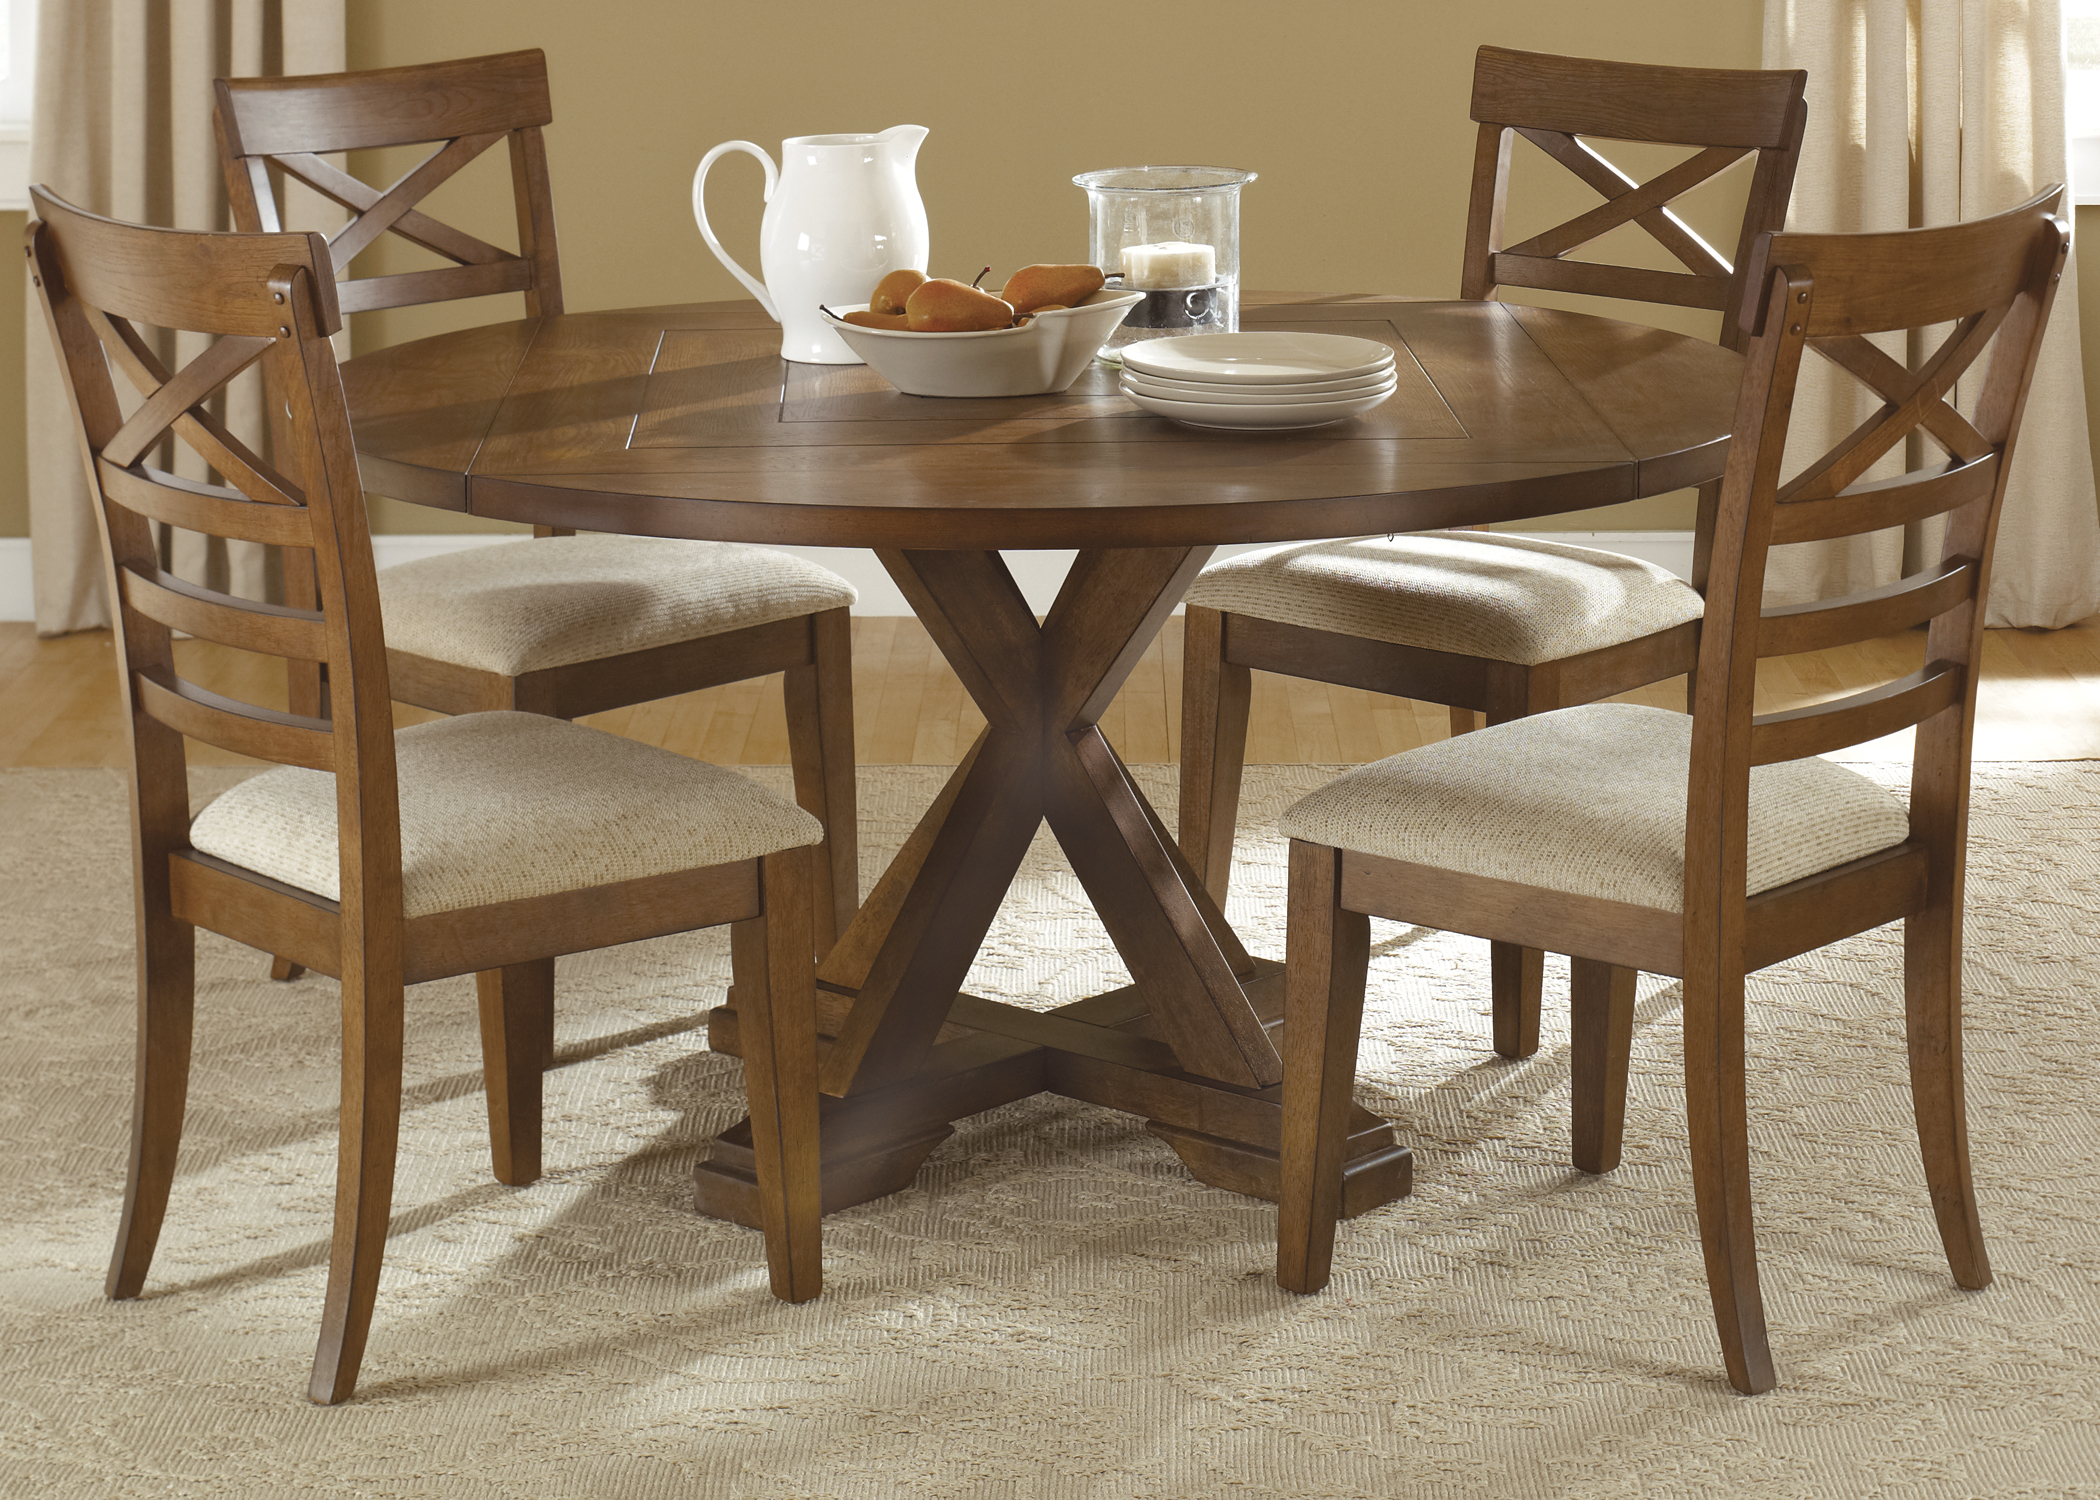 Liberty Furniture Hearthstone 5 Piece Pedestal Table Set  - Item Number: 382-DR-O5PDS